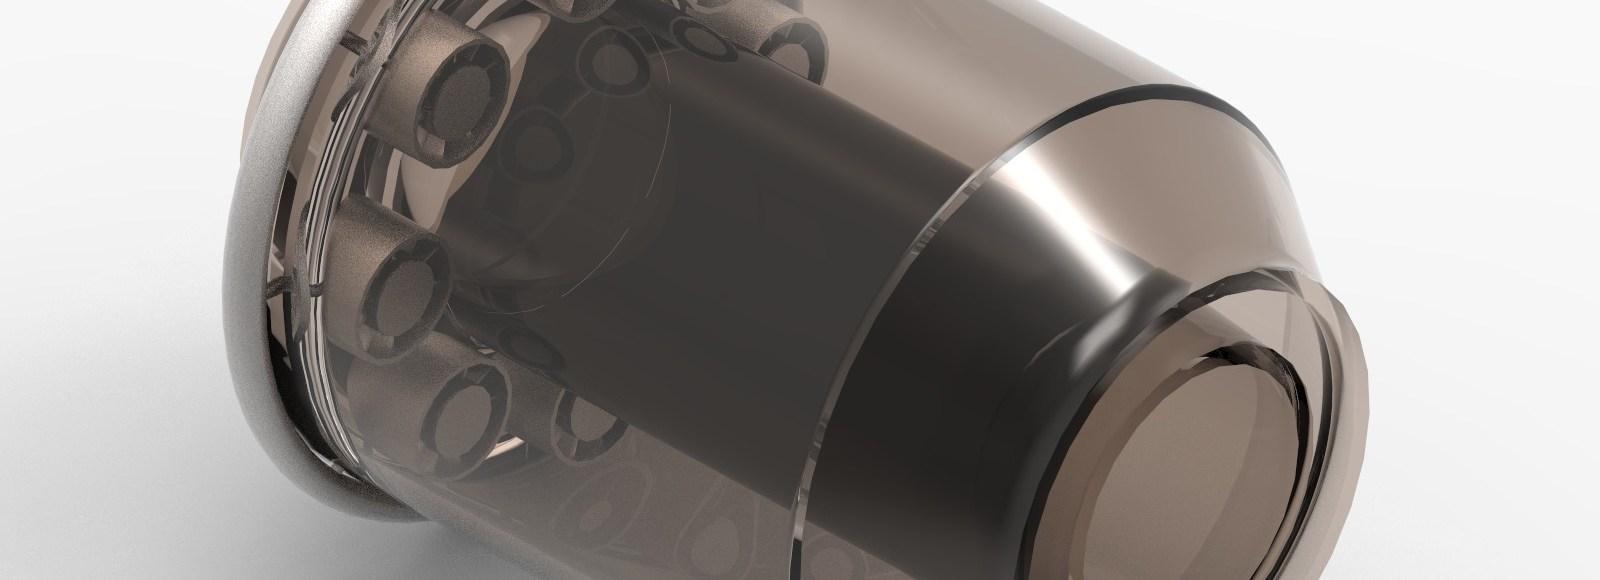 Turbofan Research – Combustor Design Challenges